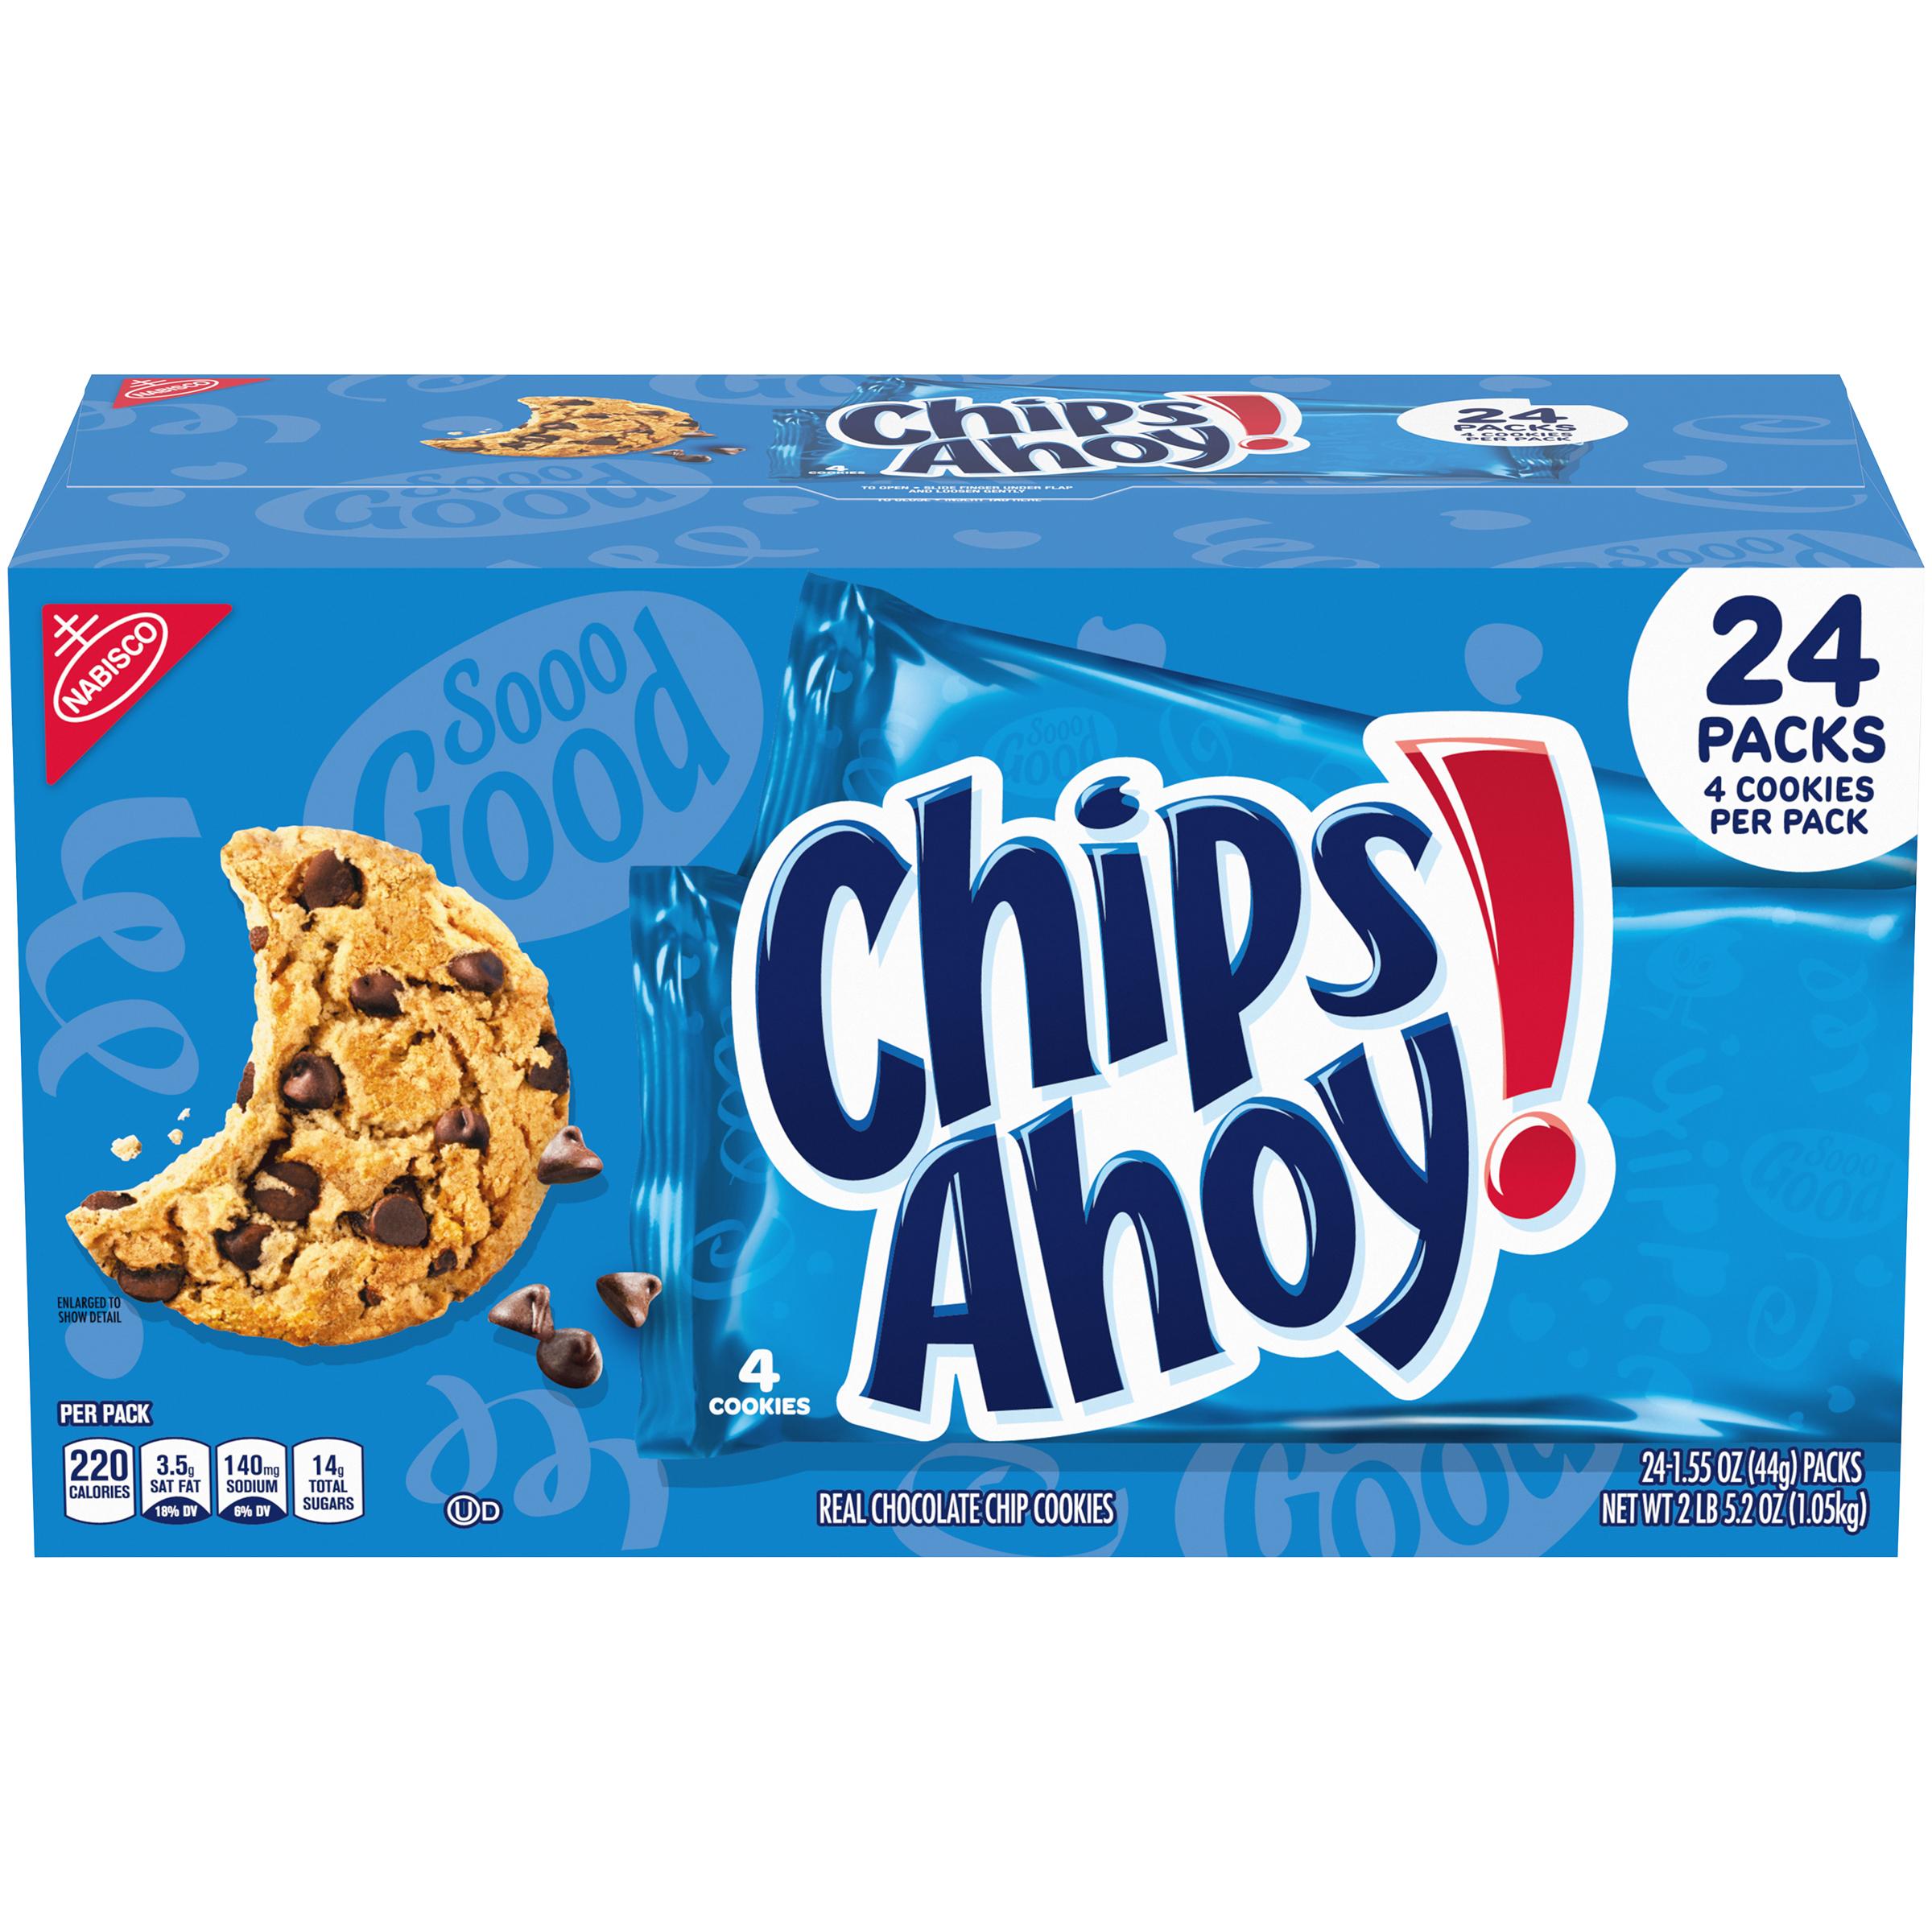 CHIPS AHOY! Cookies 37.2 oz